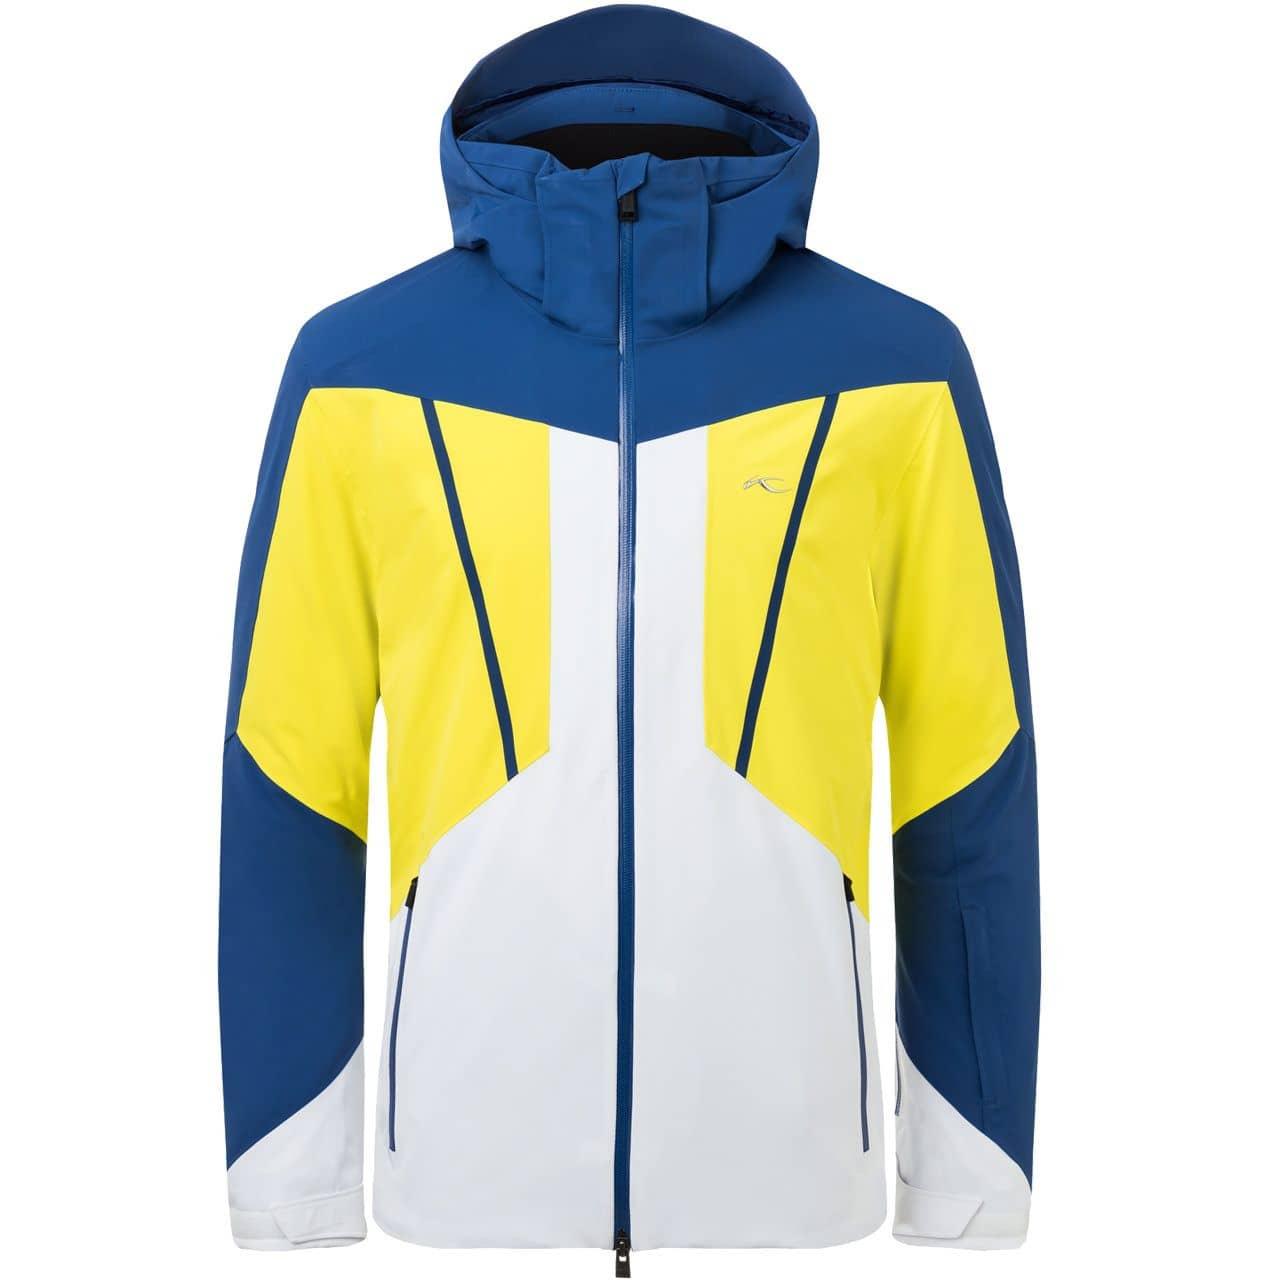 Kjus Men Jacket BOVAL southern blue/citric yellow - 54